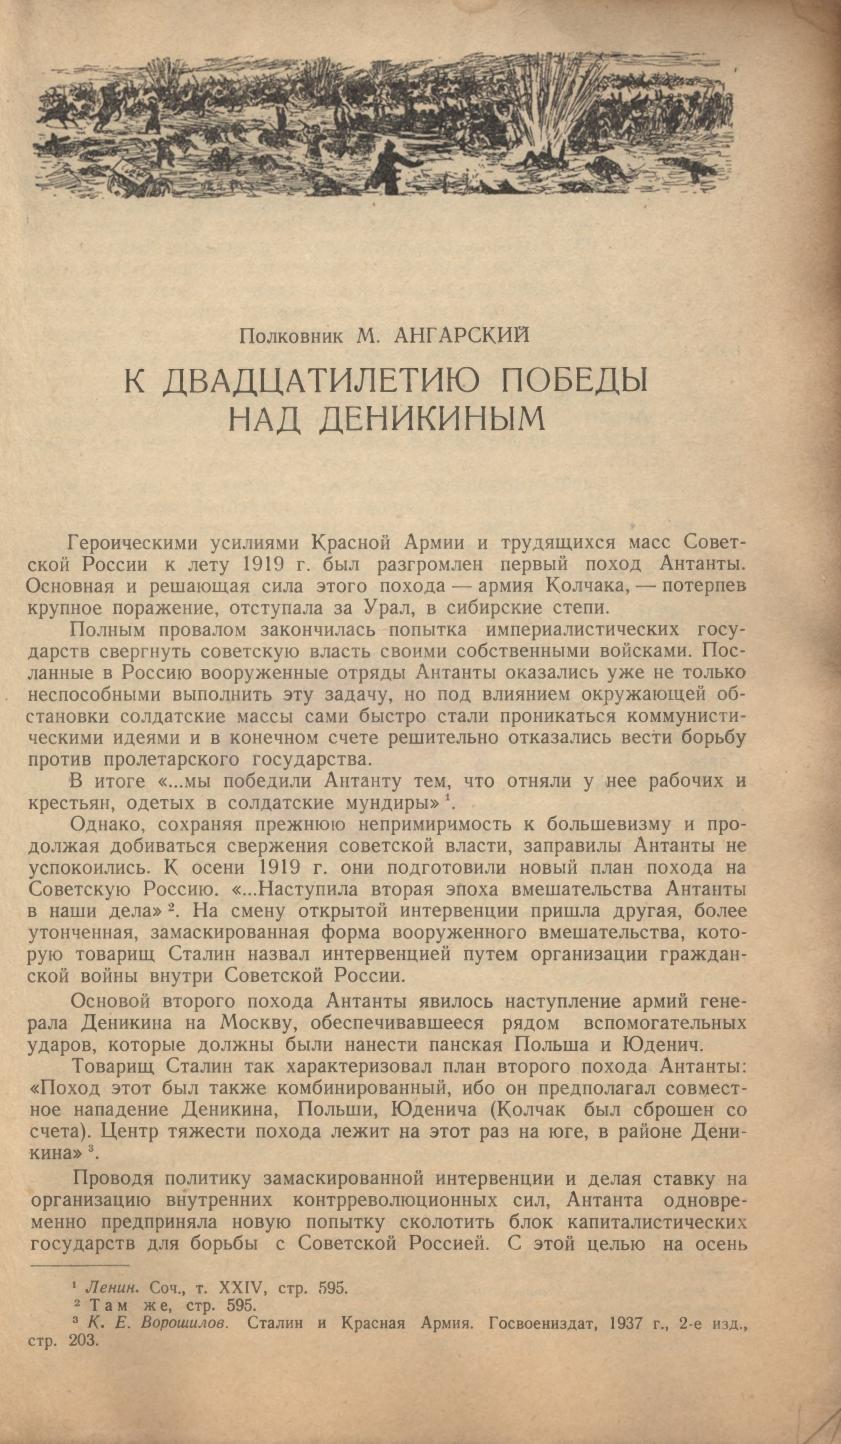 http://i6.imageban.ru/out/2014/01/15/35fa0d15226c01b0b686f3842aa6319a.jpg